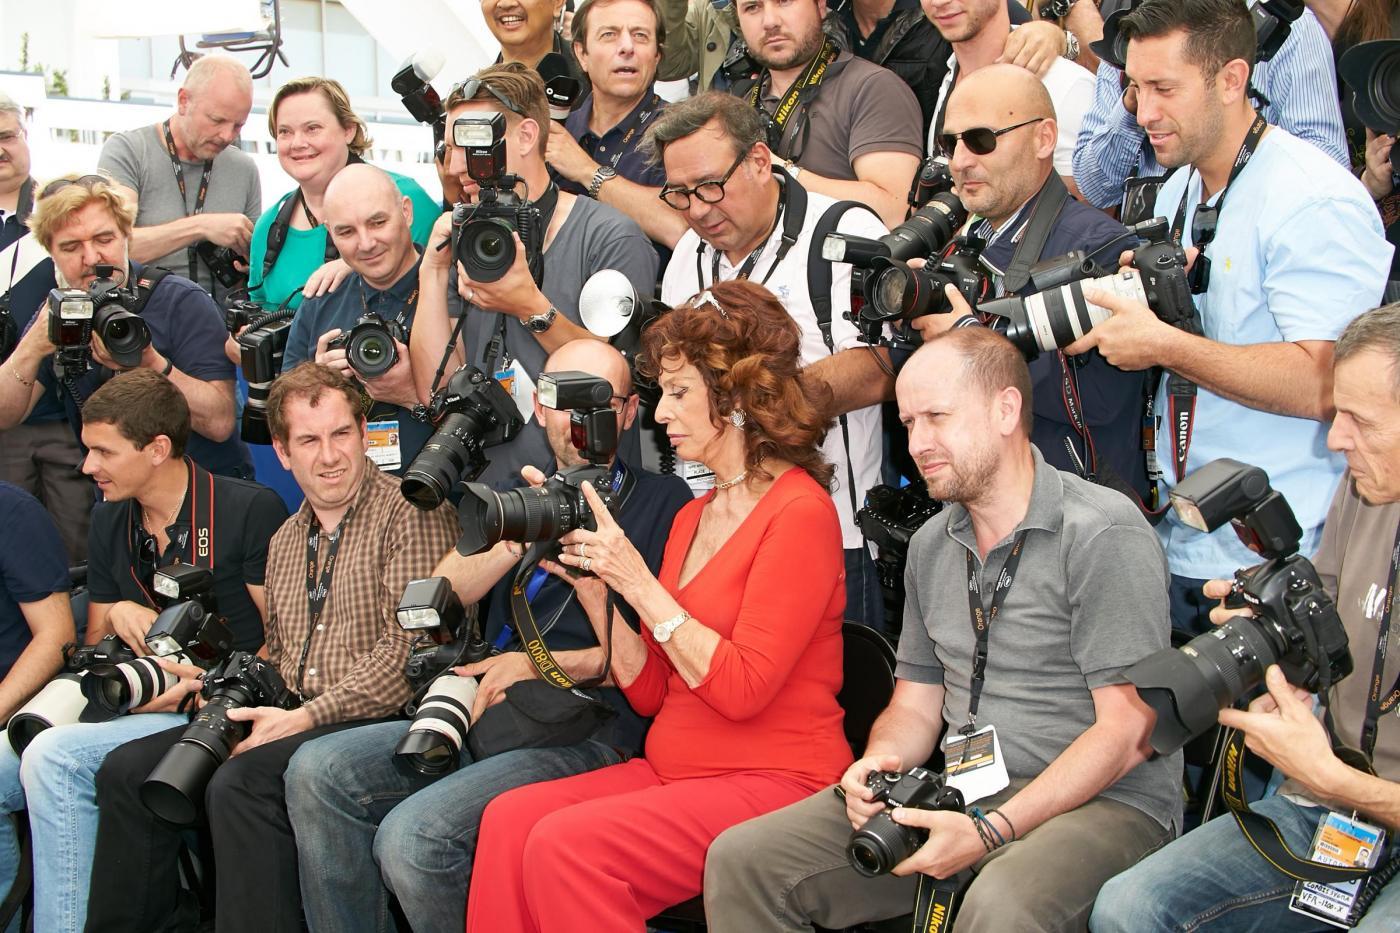 Sofia Loren a Cannes Ho 80 anni e ancora tanta energia4